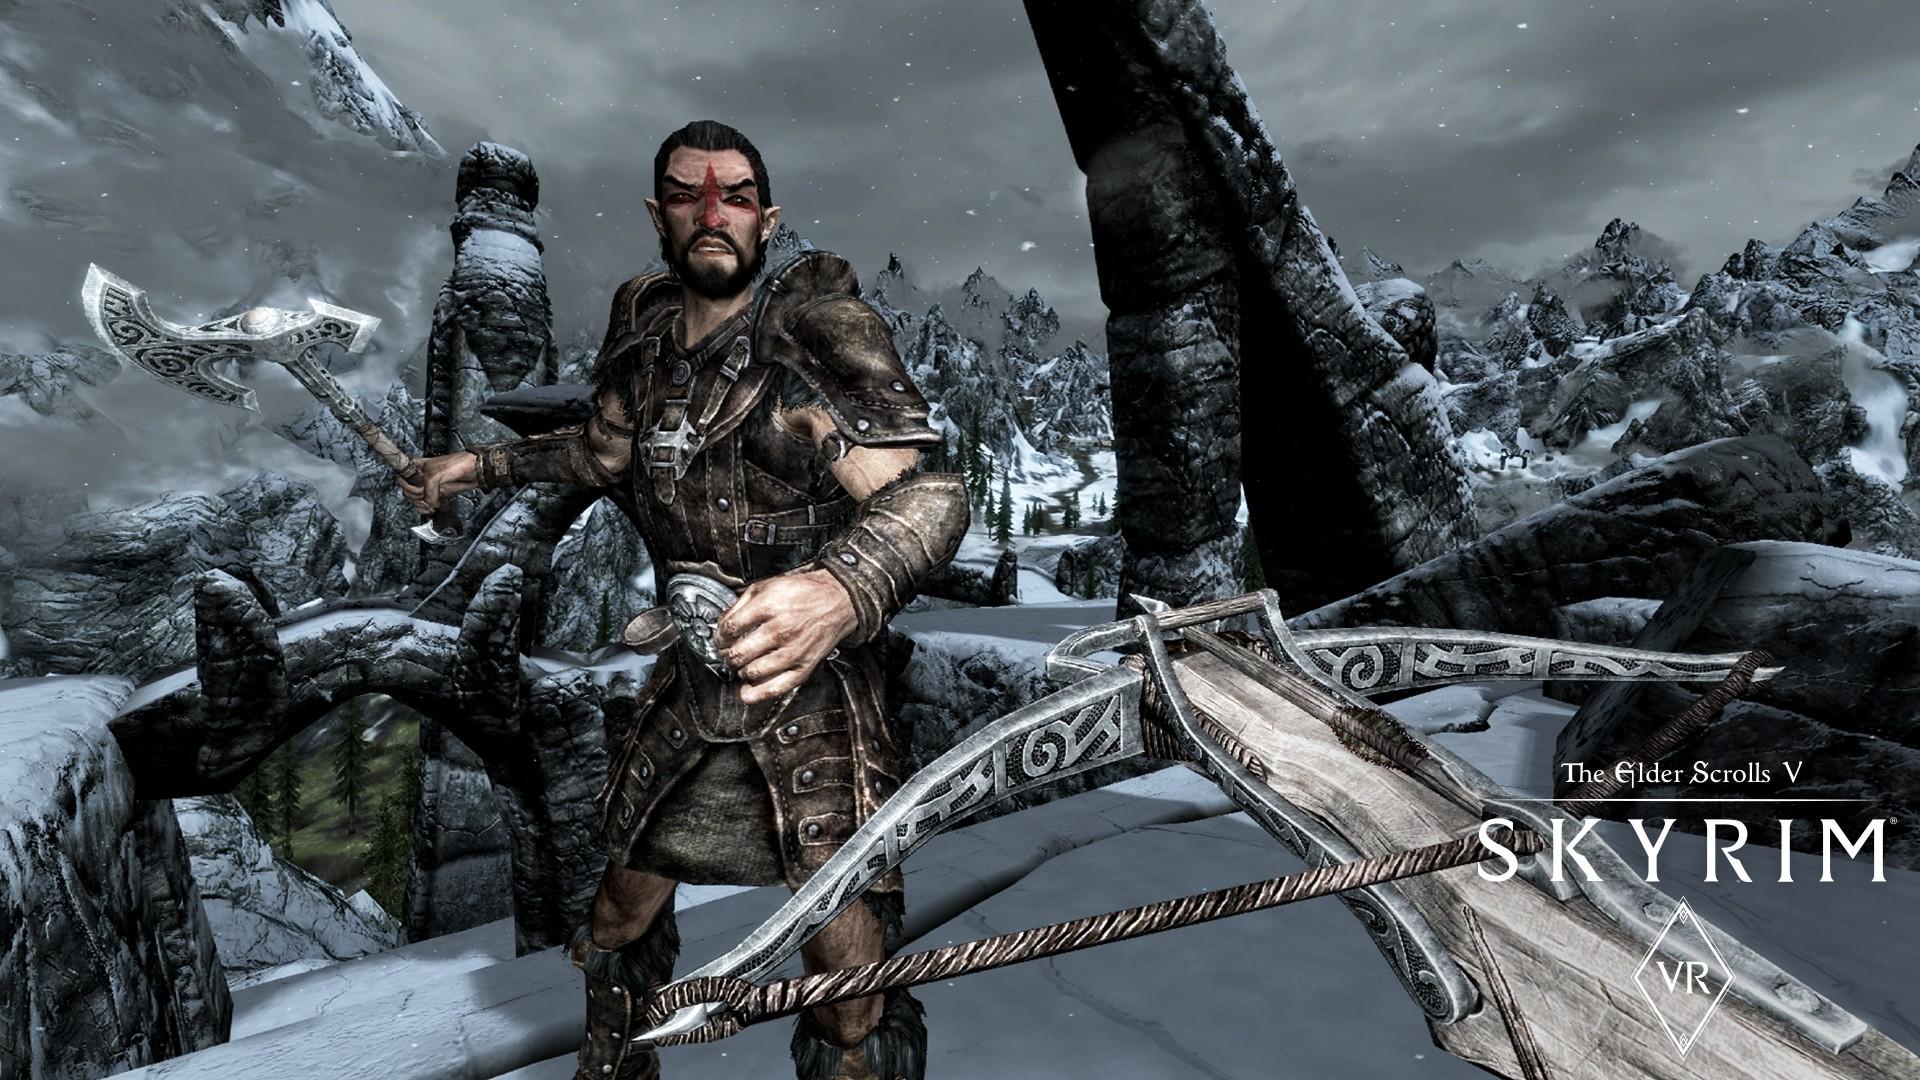 Buy The Elder Scrolls V: Skyrim VR Steam